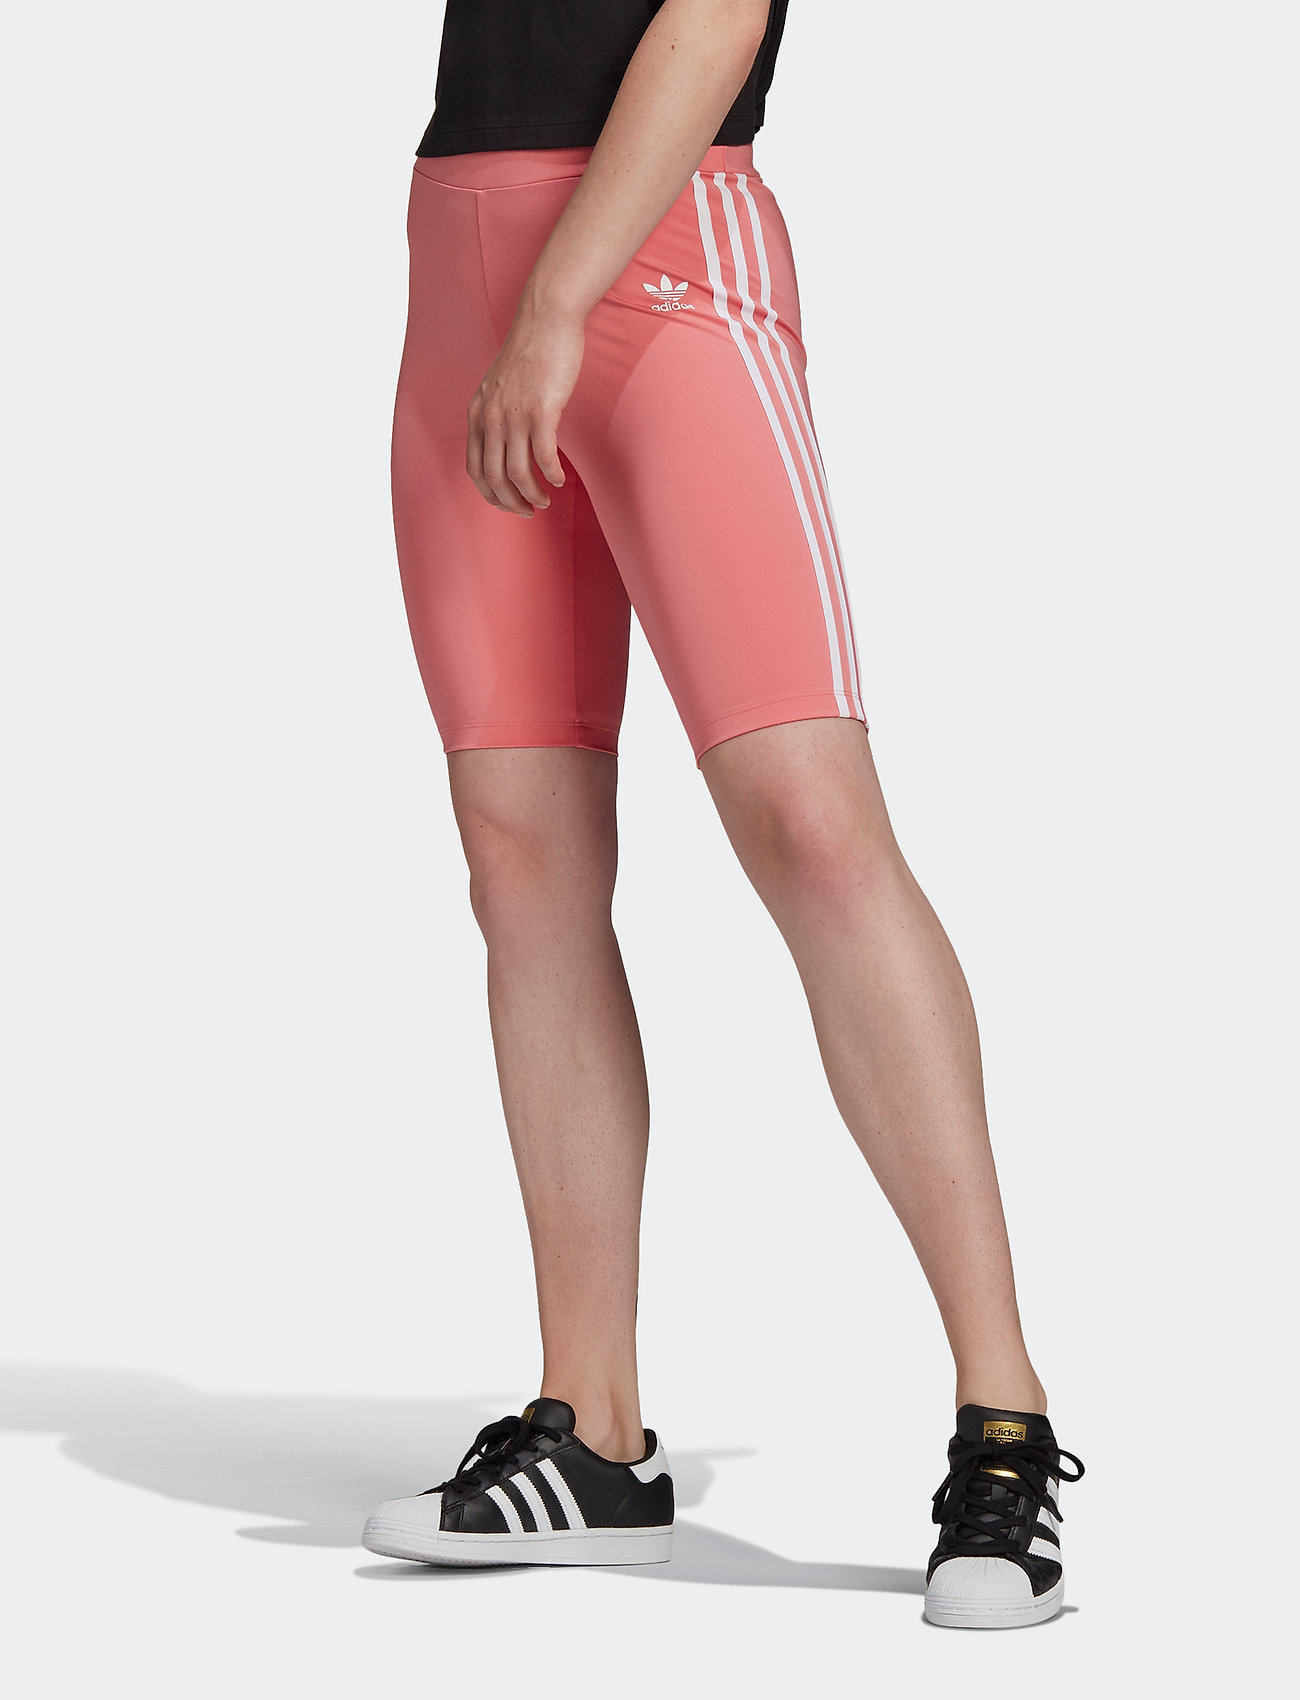 adidas Originals - Adicolor Classics Primeblue High-Waisted Short Tights W - träningsshorts - hazros - 0